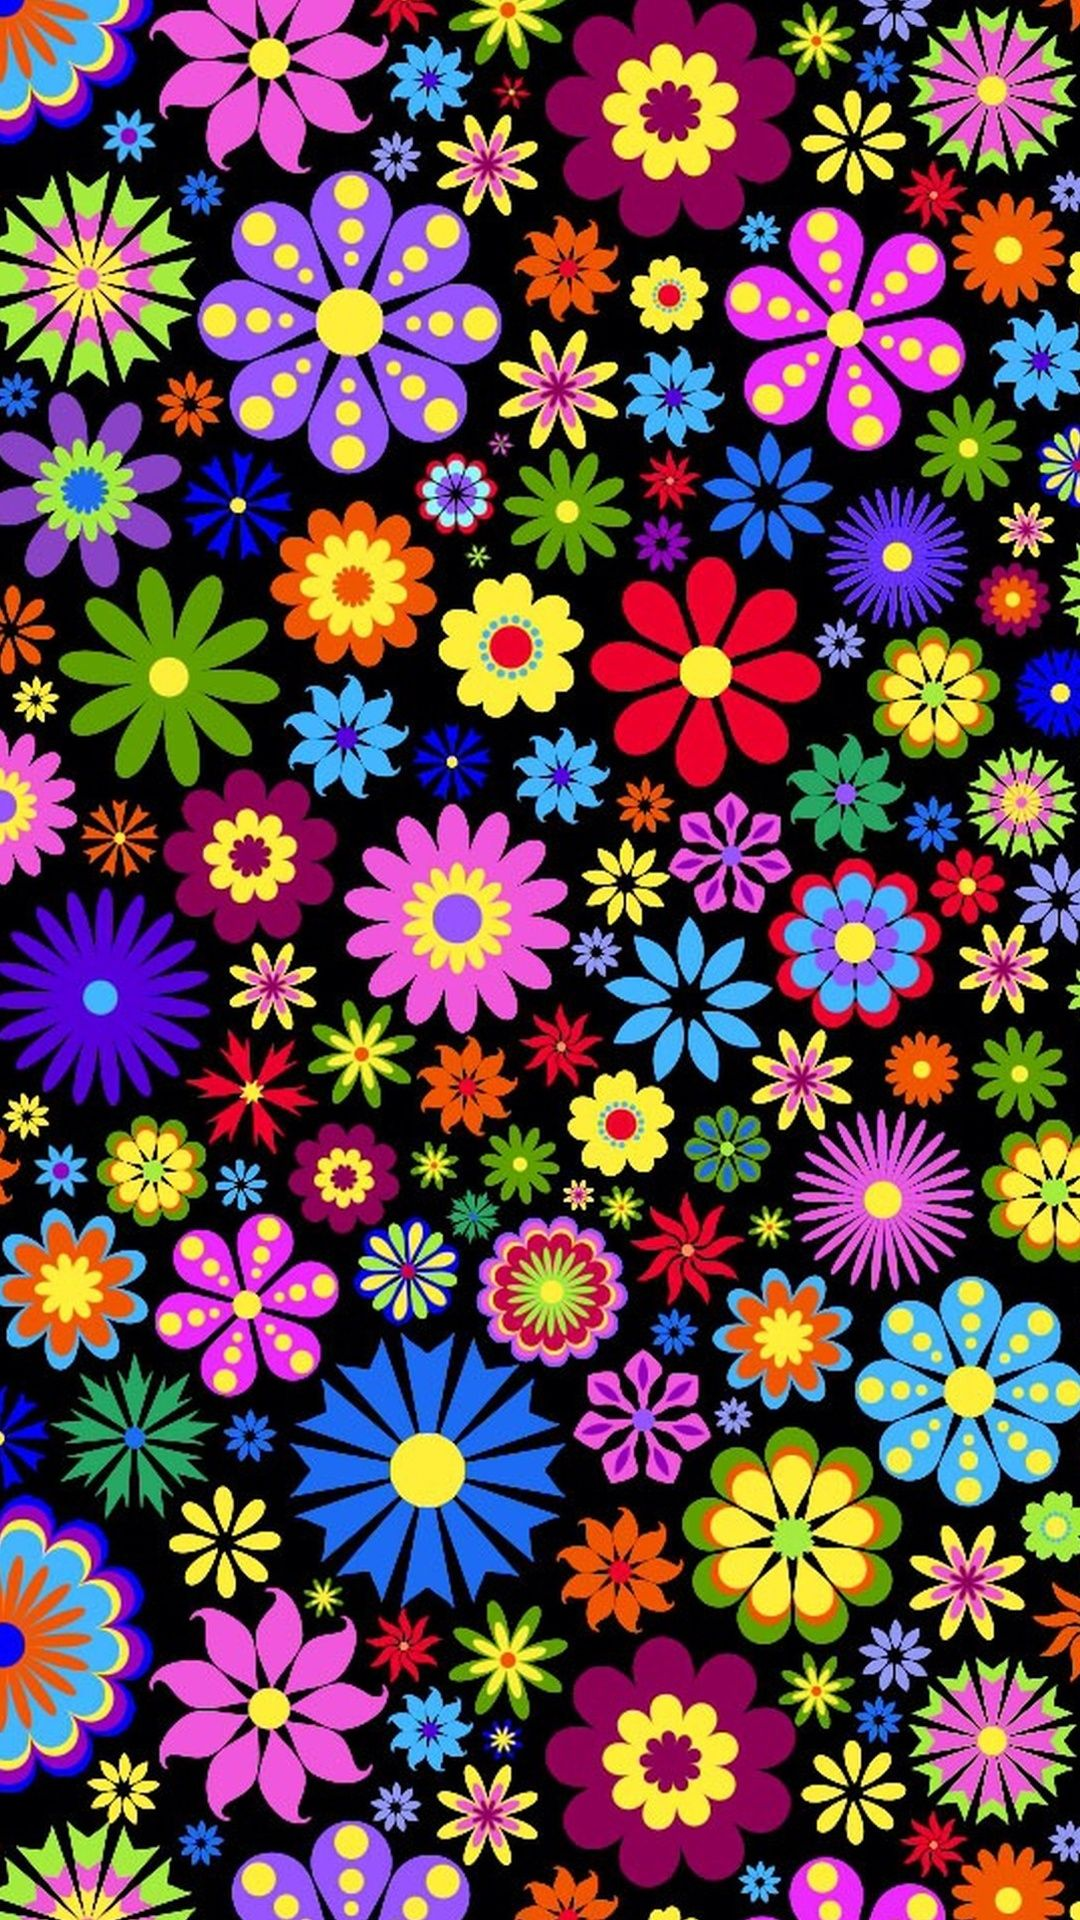 Free Colorful Flower Wallpaper Downloads: #cute #retro #flower #background #wallpaper